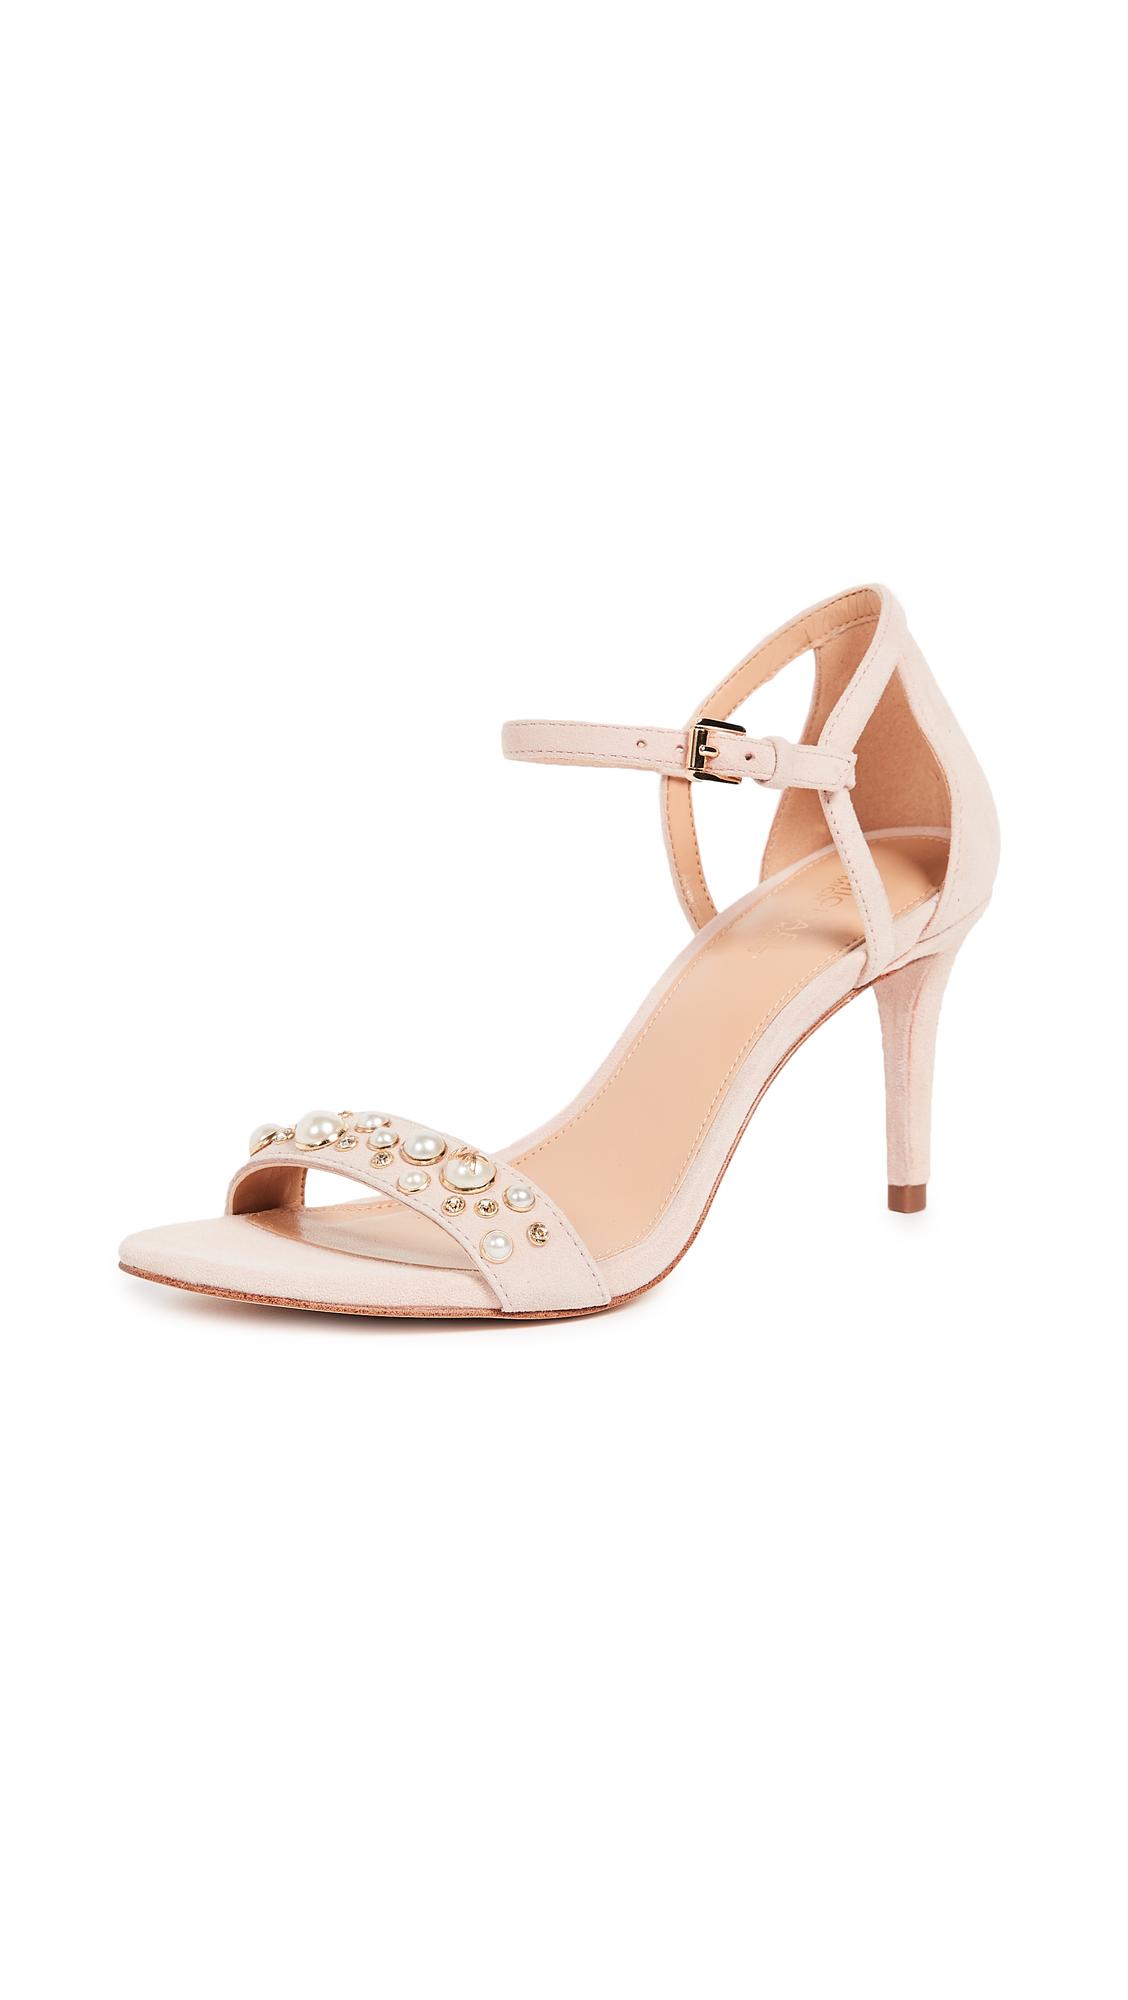 MICHAEL Michael Kors Simone Mid Sandals - Soft Pink